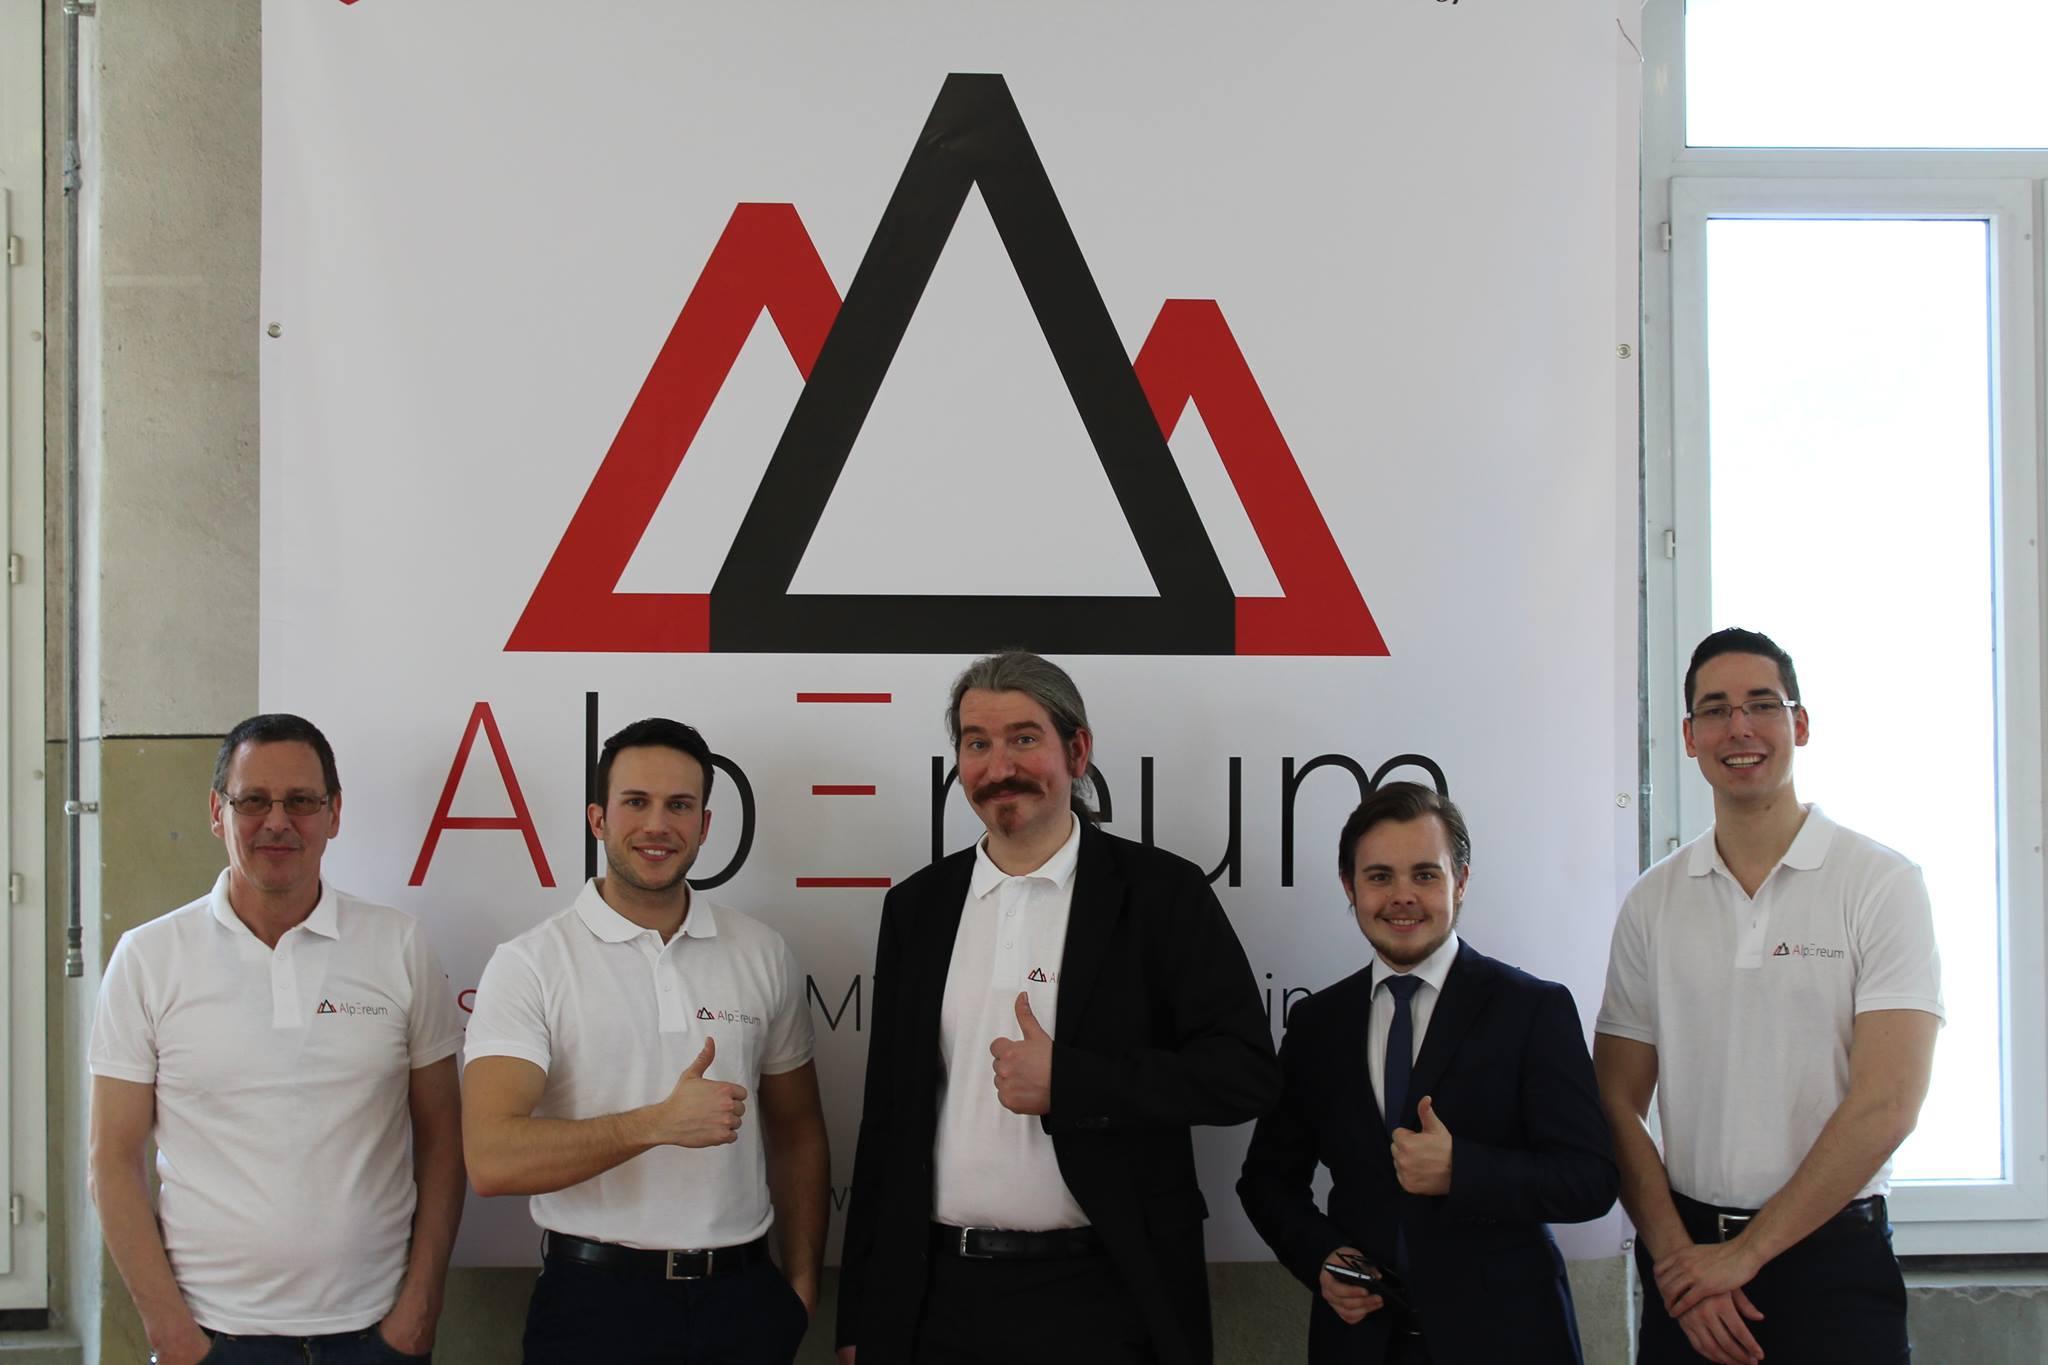 AlpEreum Project: Team